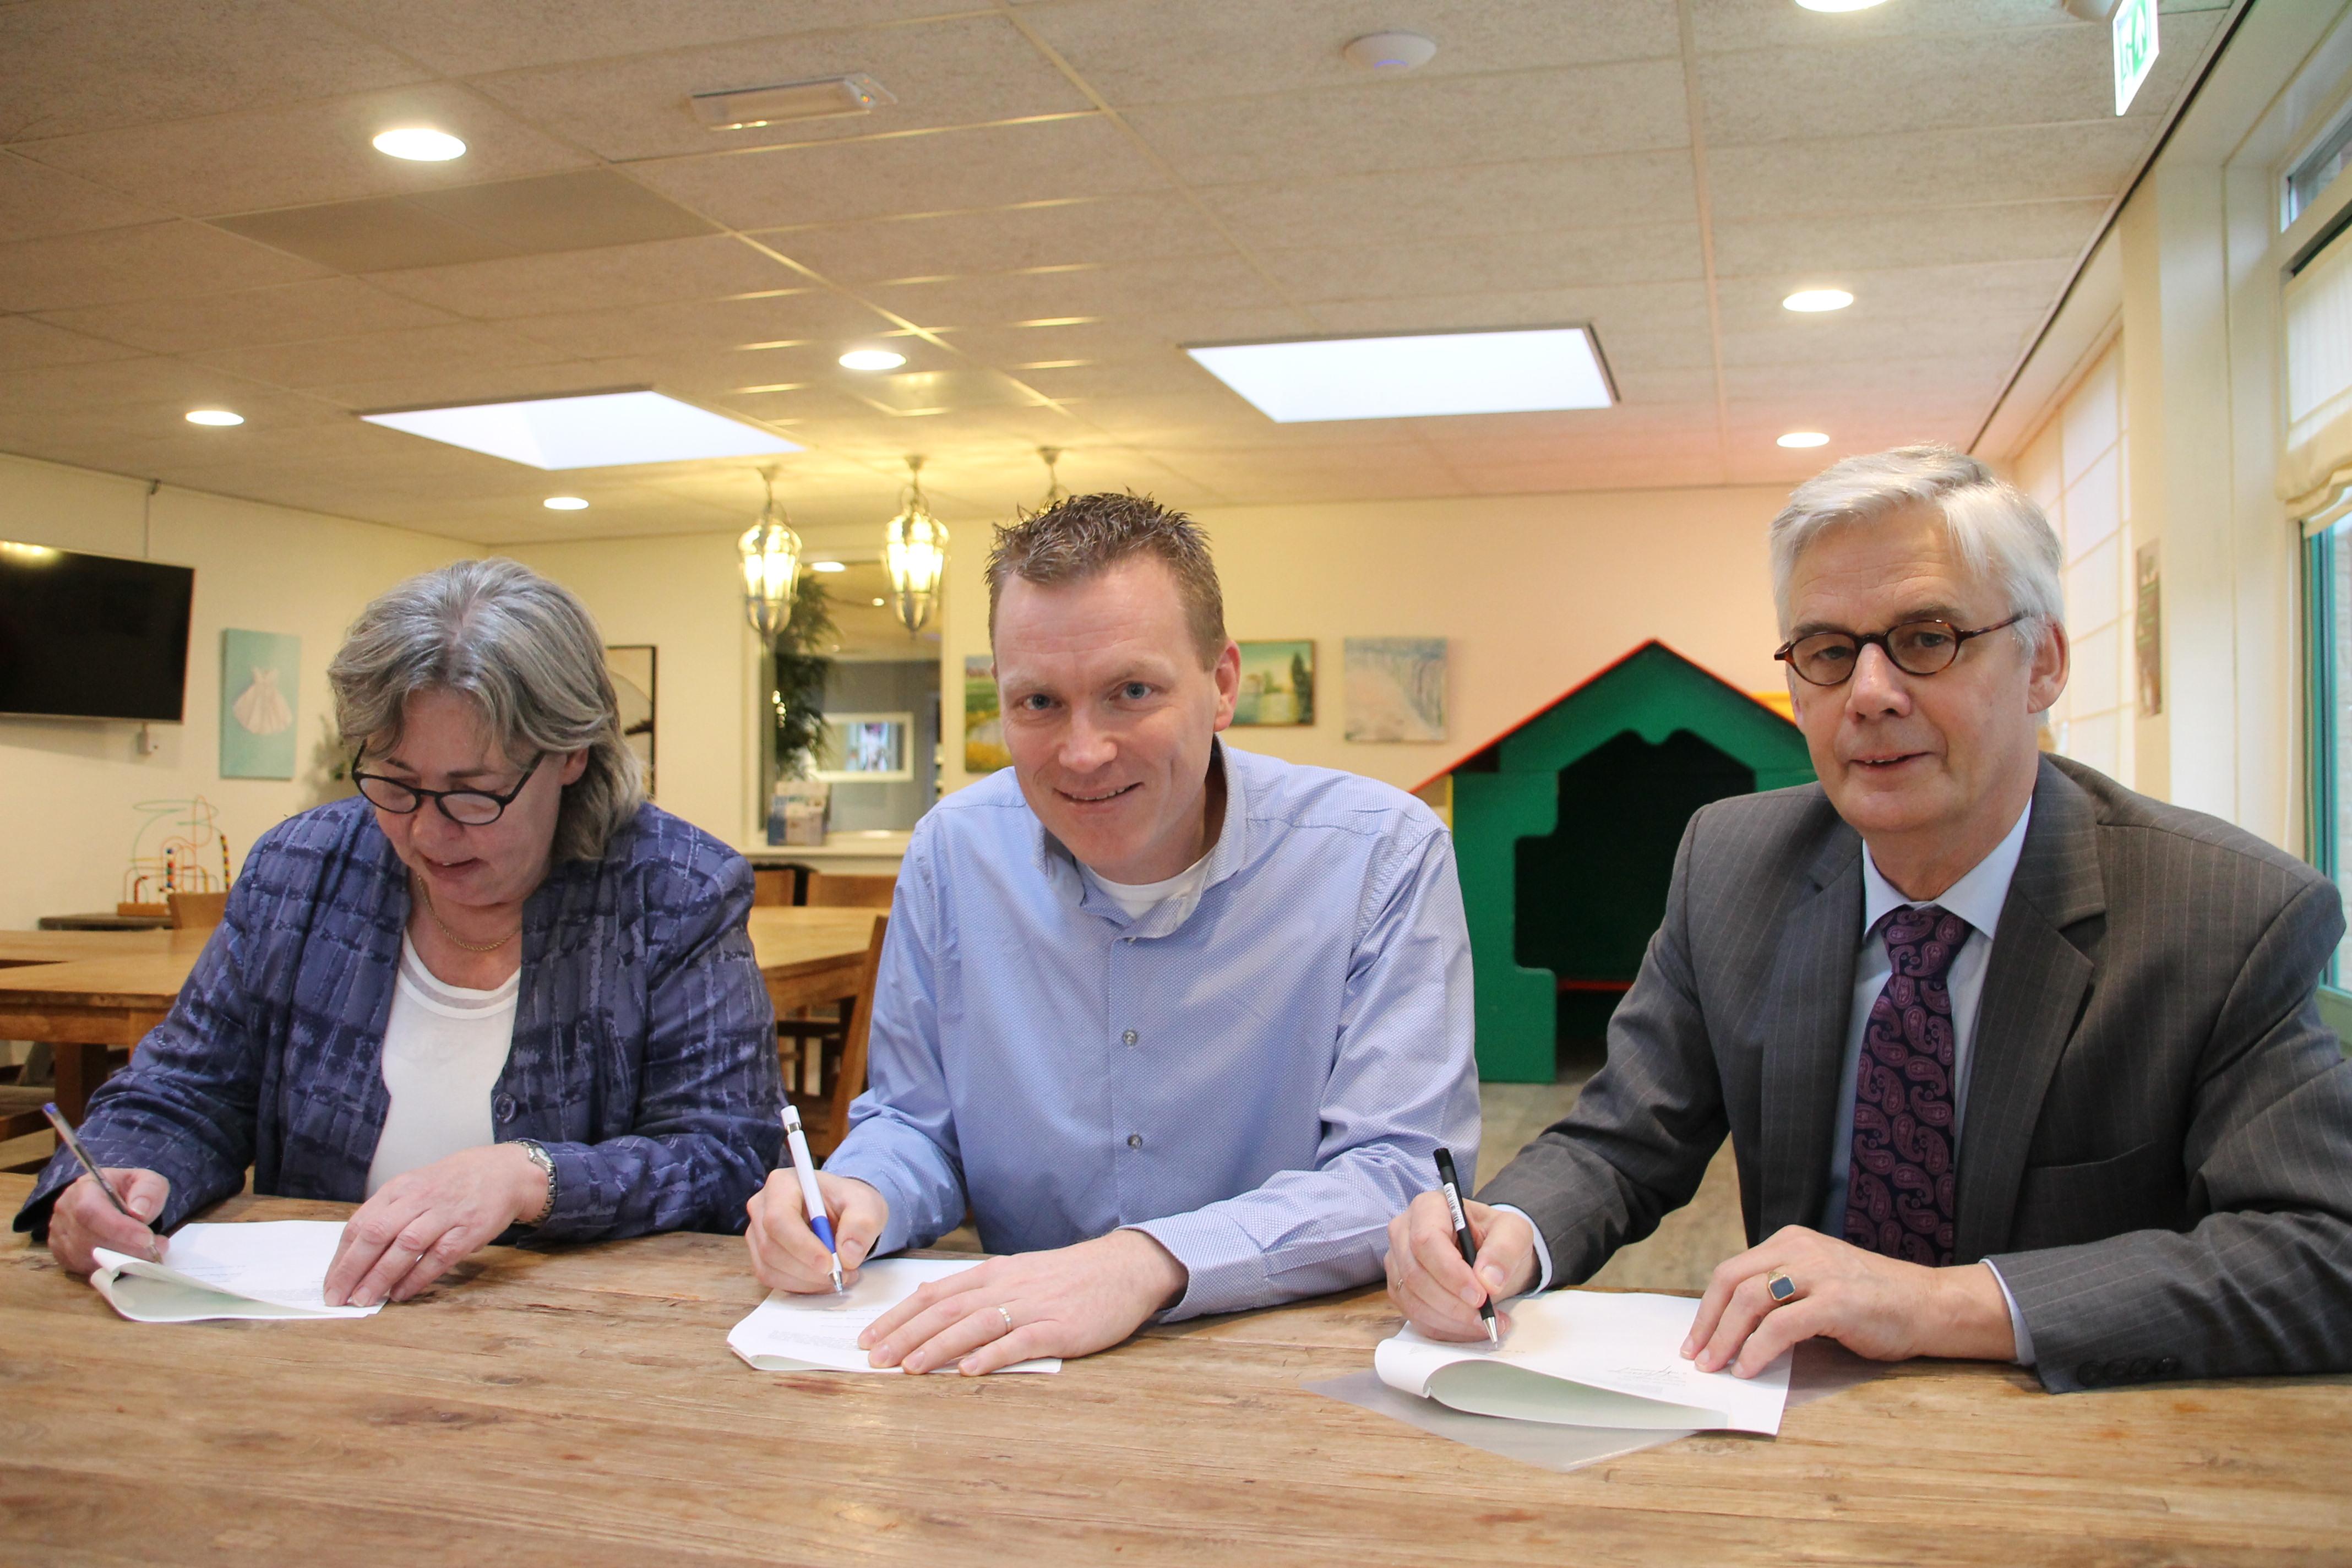 Gemeente en Stichting Molenduinbad Norg bekrachtigen samenwerking